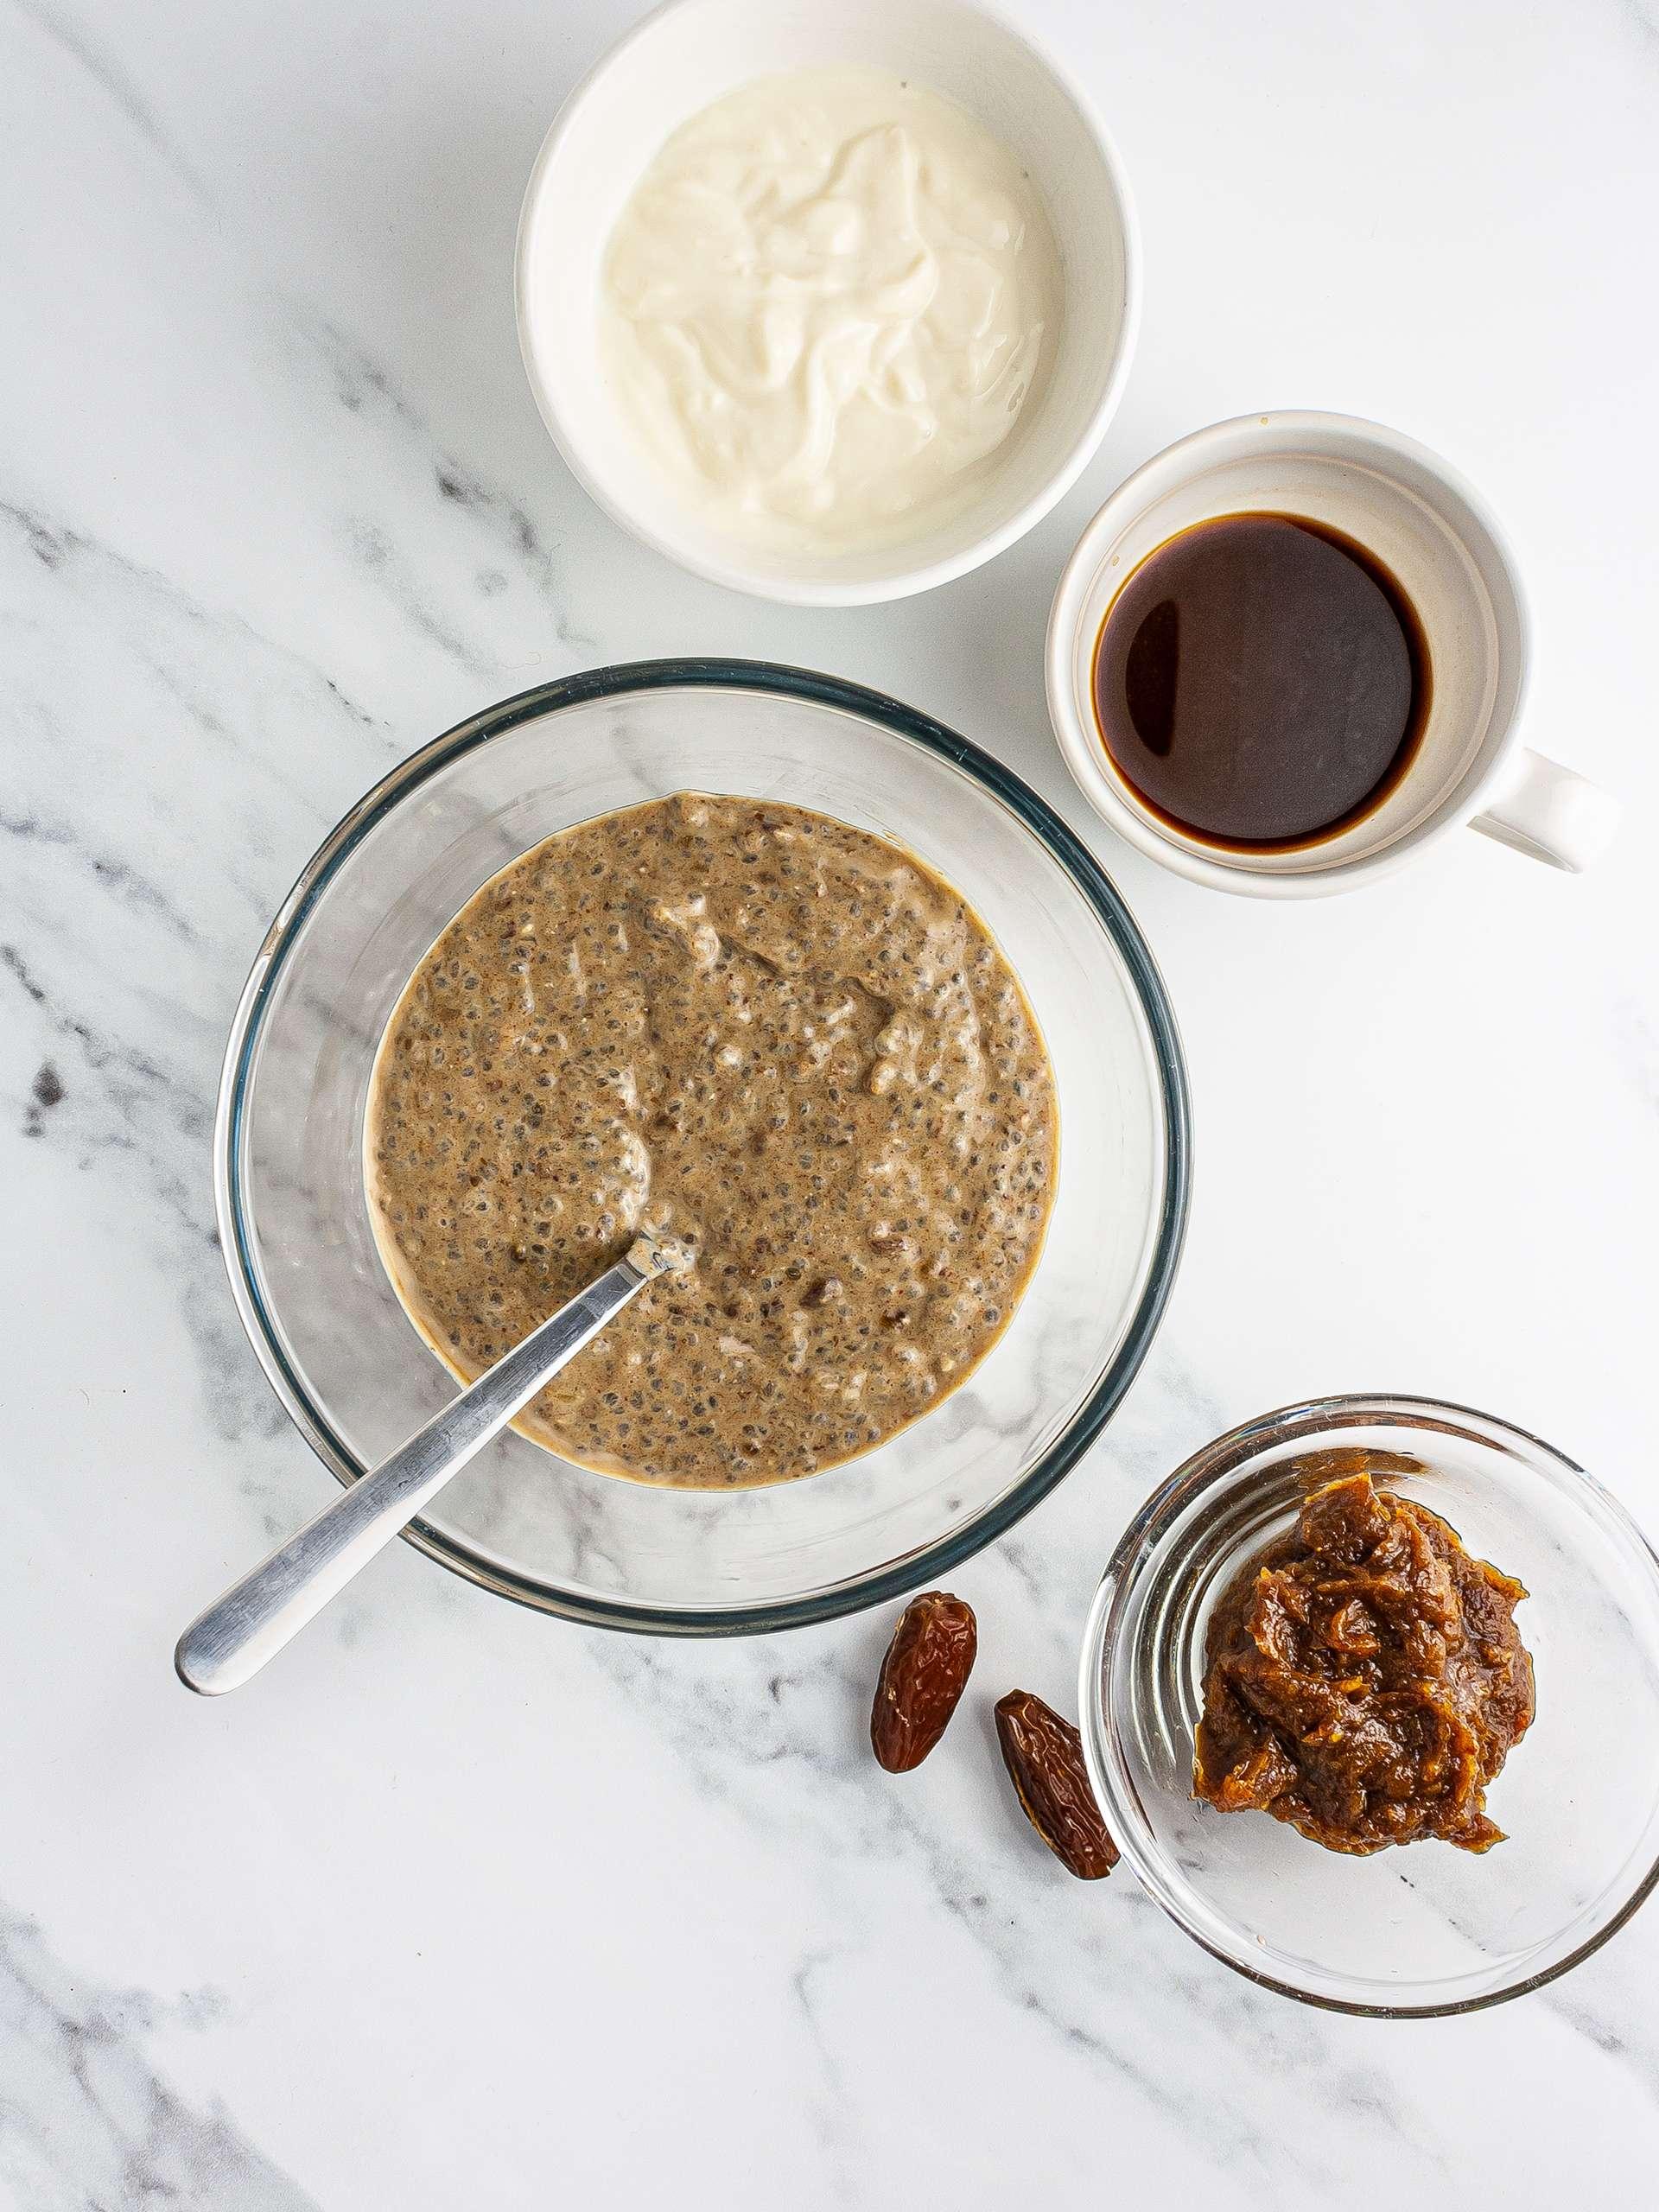 Date paste, chia seeds, yogurt, and coffee mixture.